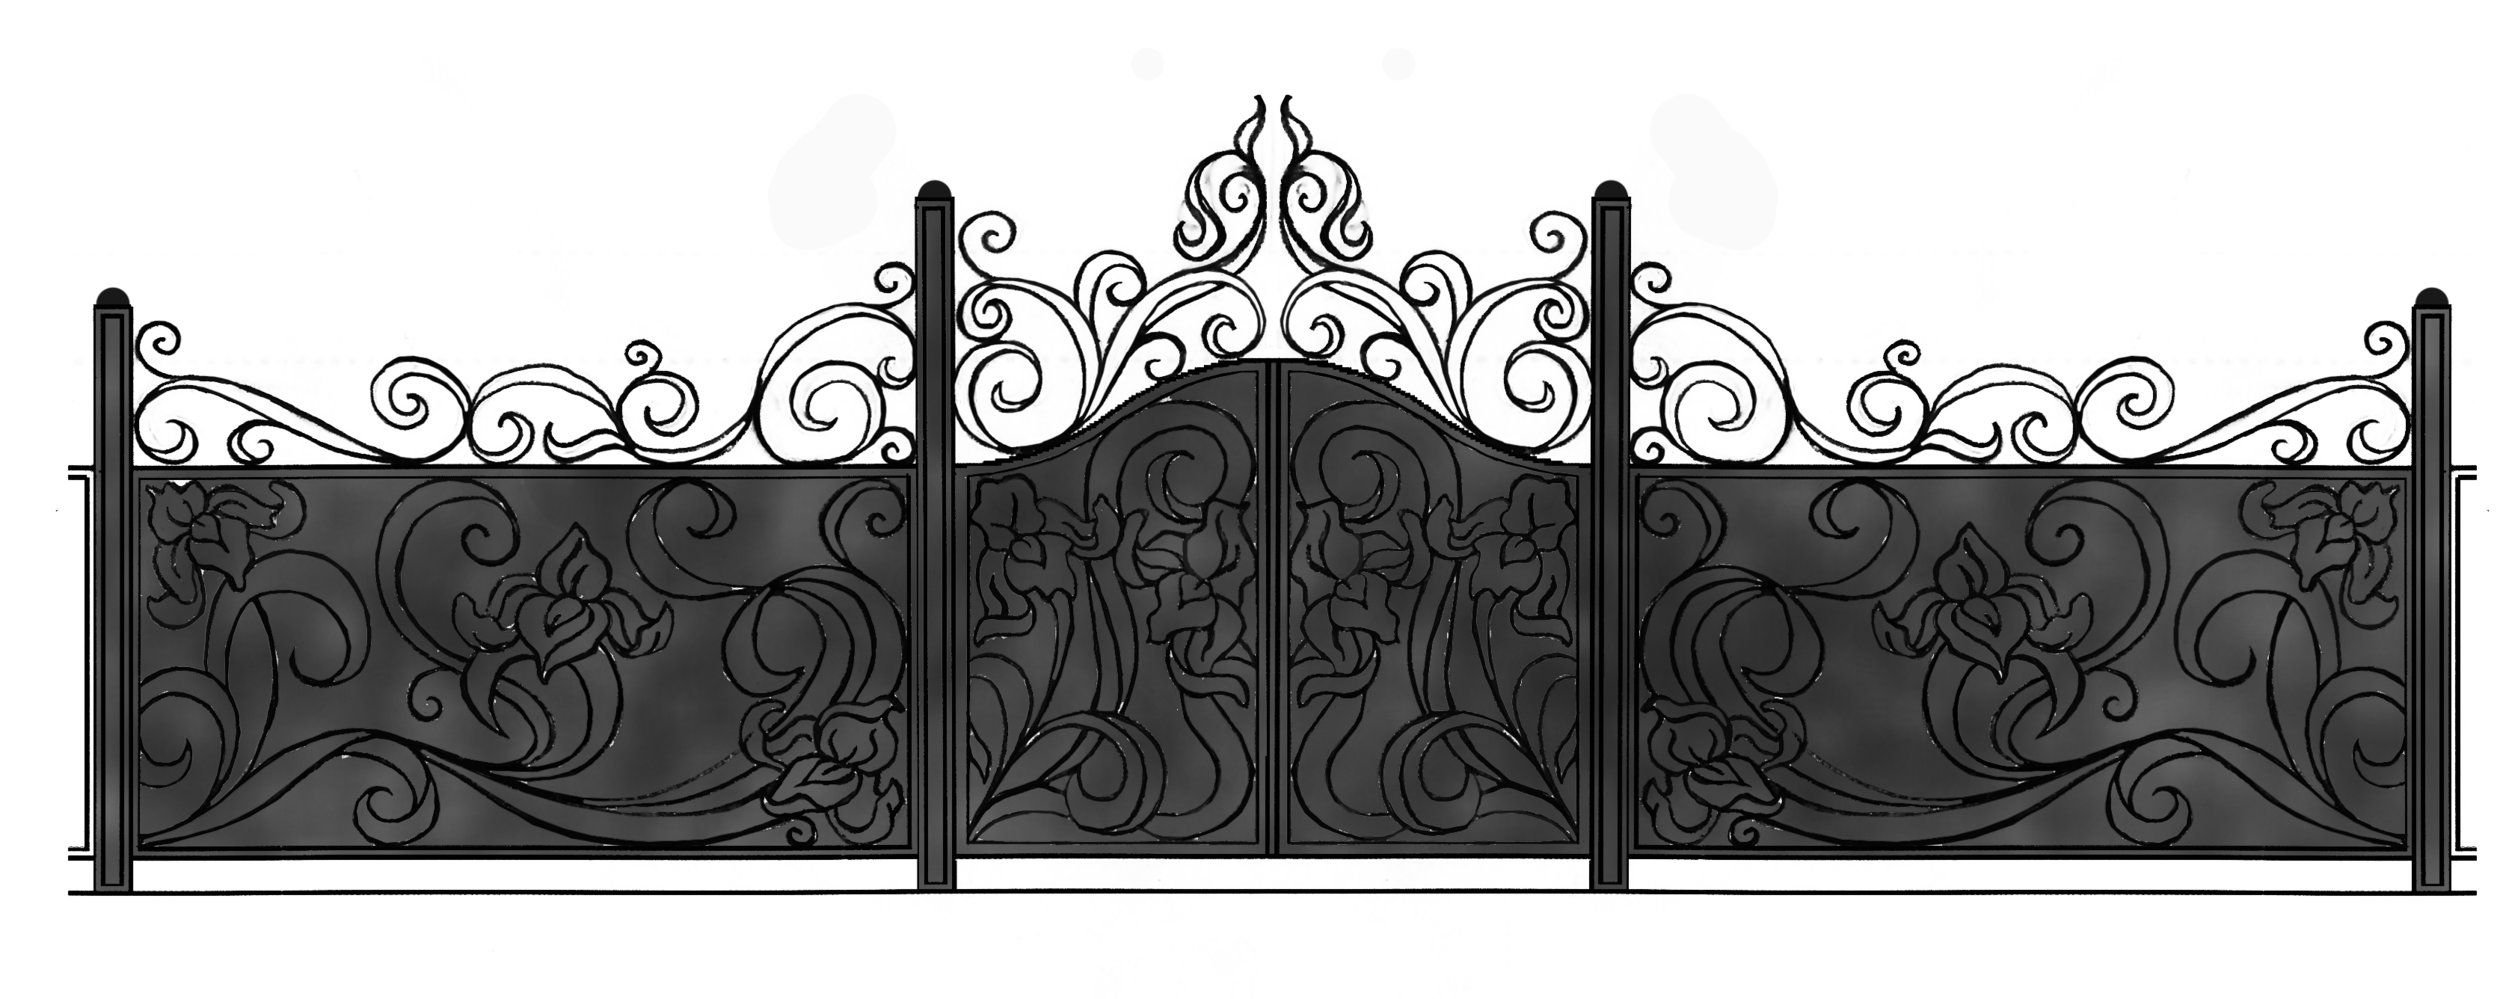 Gate design 4.27.2017.jpg